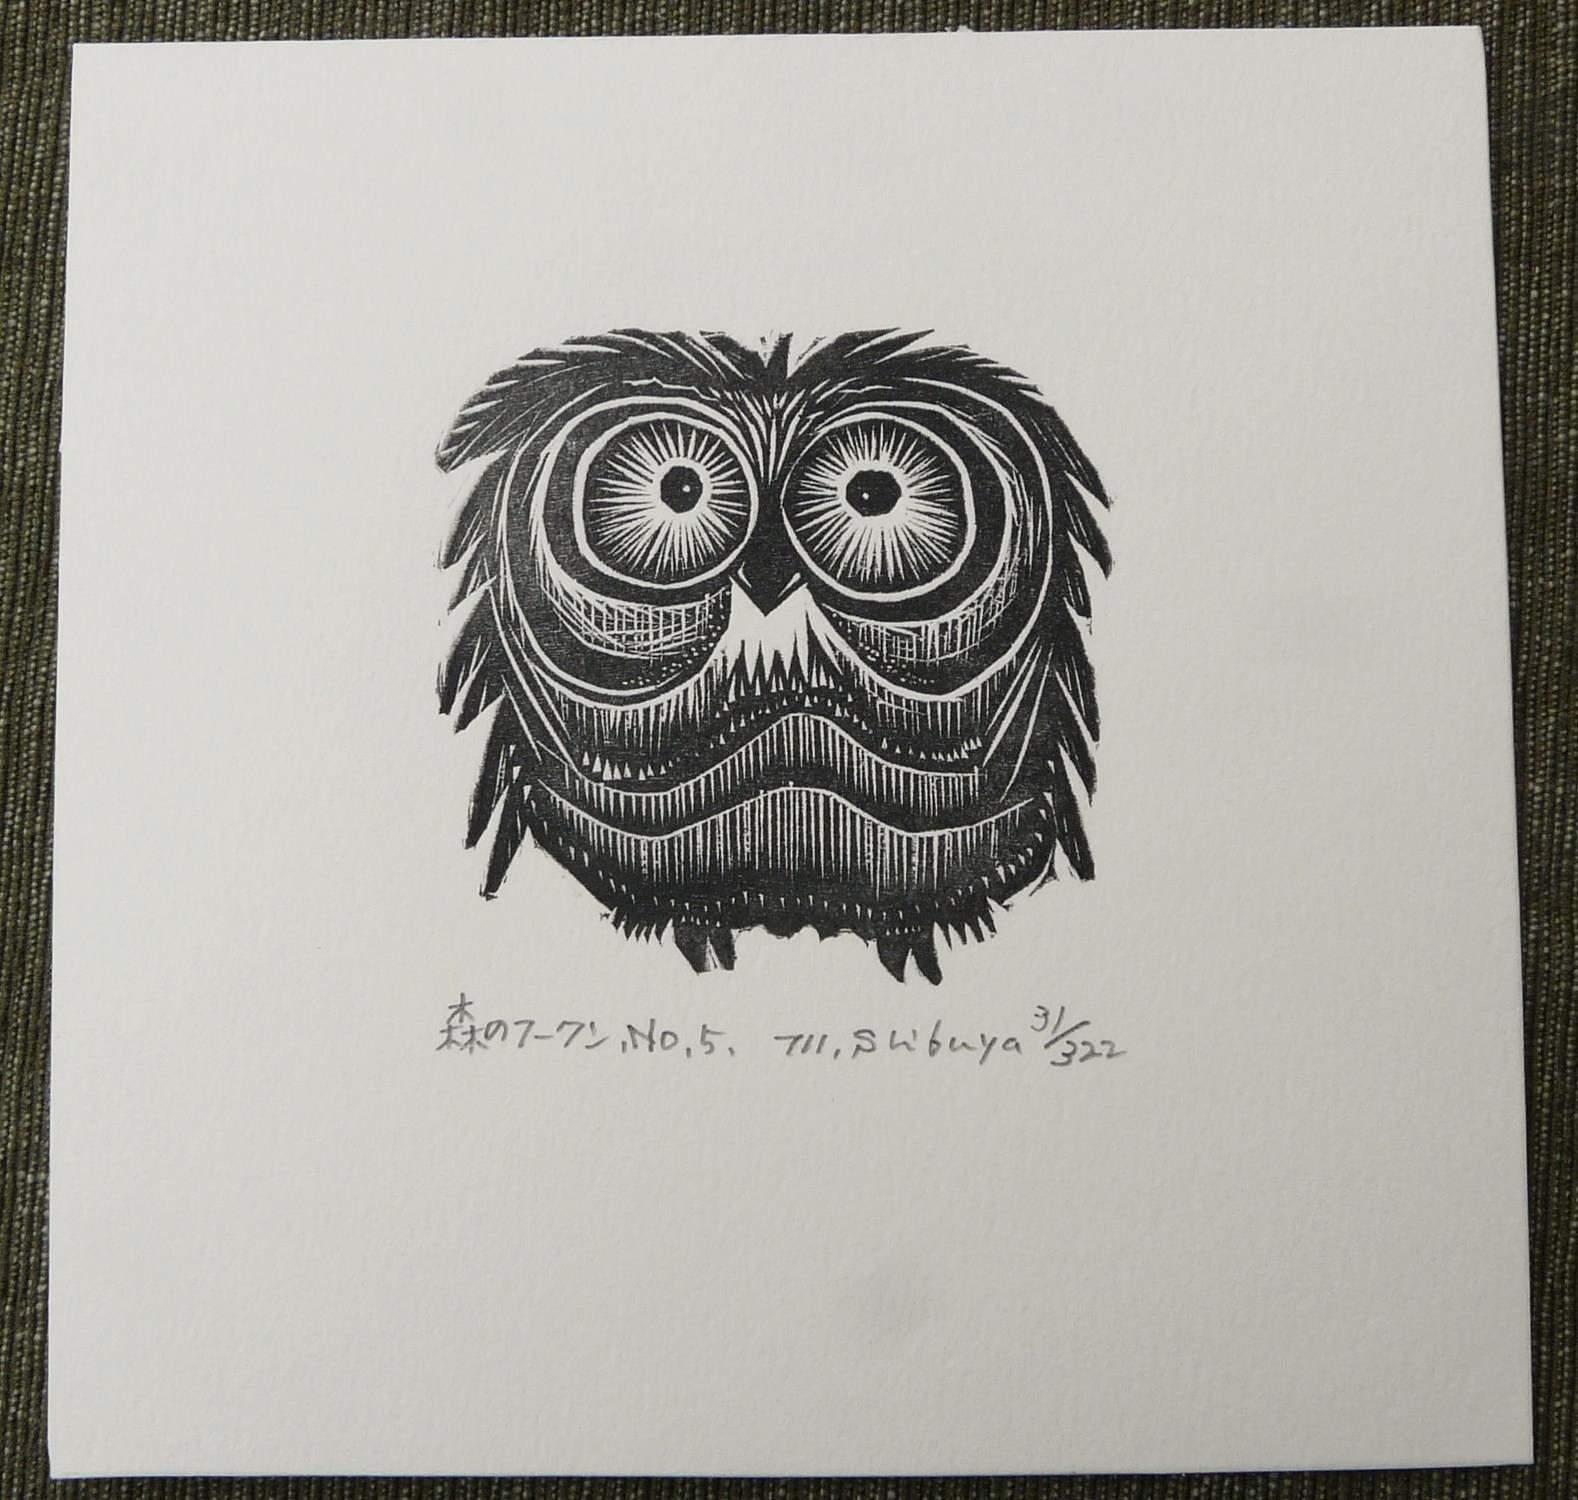 #P4278 FOREST OWL By MASAKI SHIBUYA